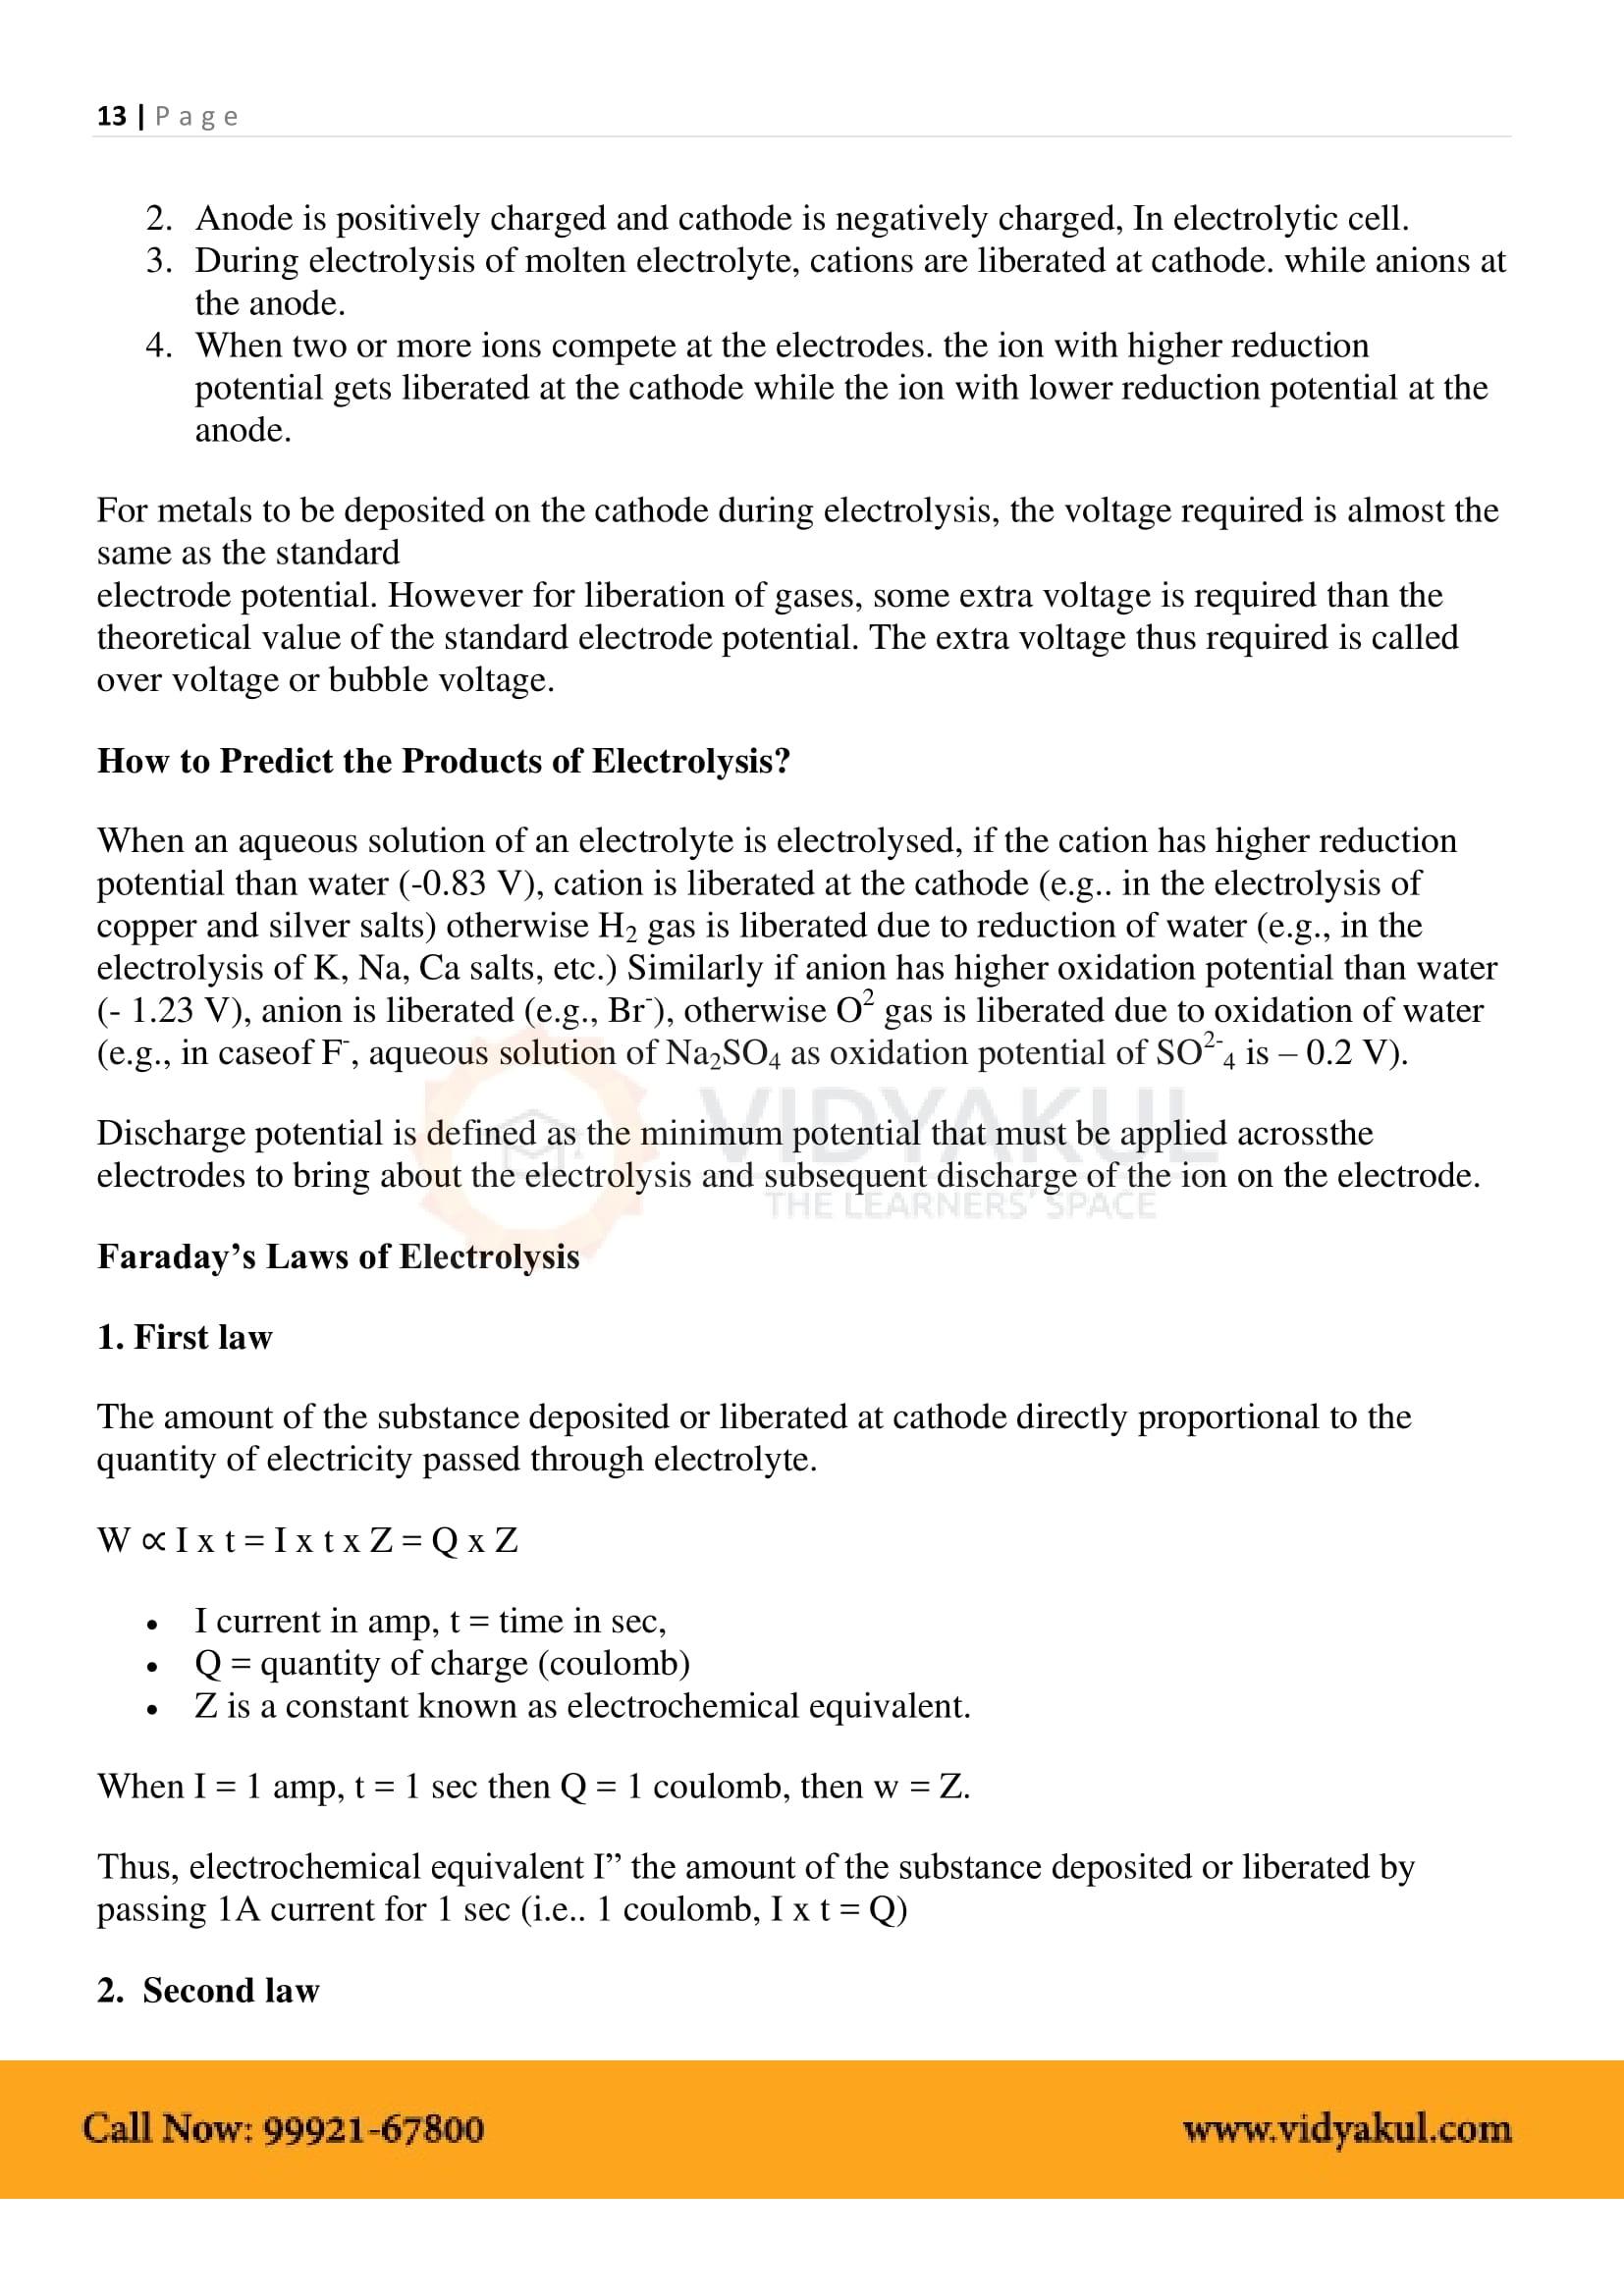 Electrochemistry Class 12 Notes | Vidyakul